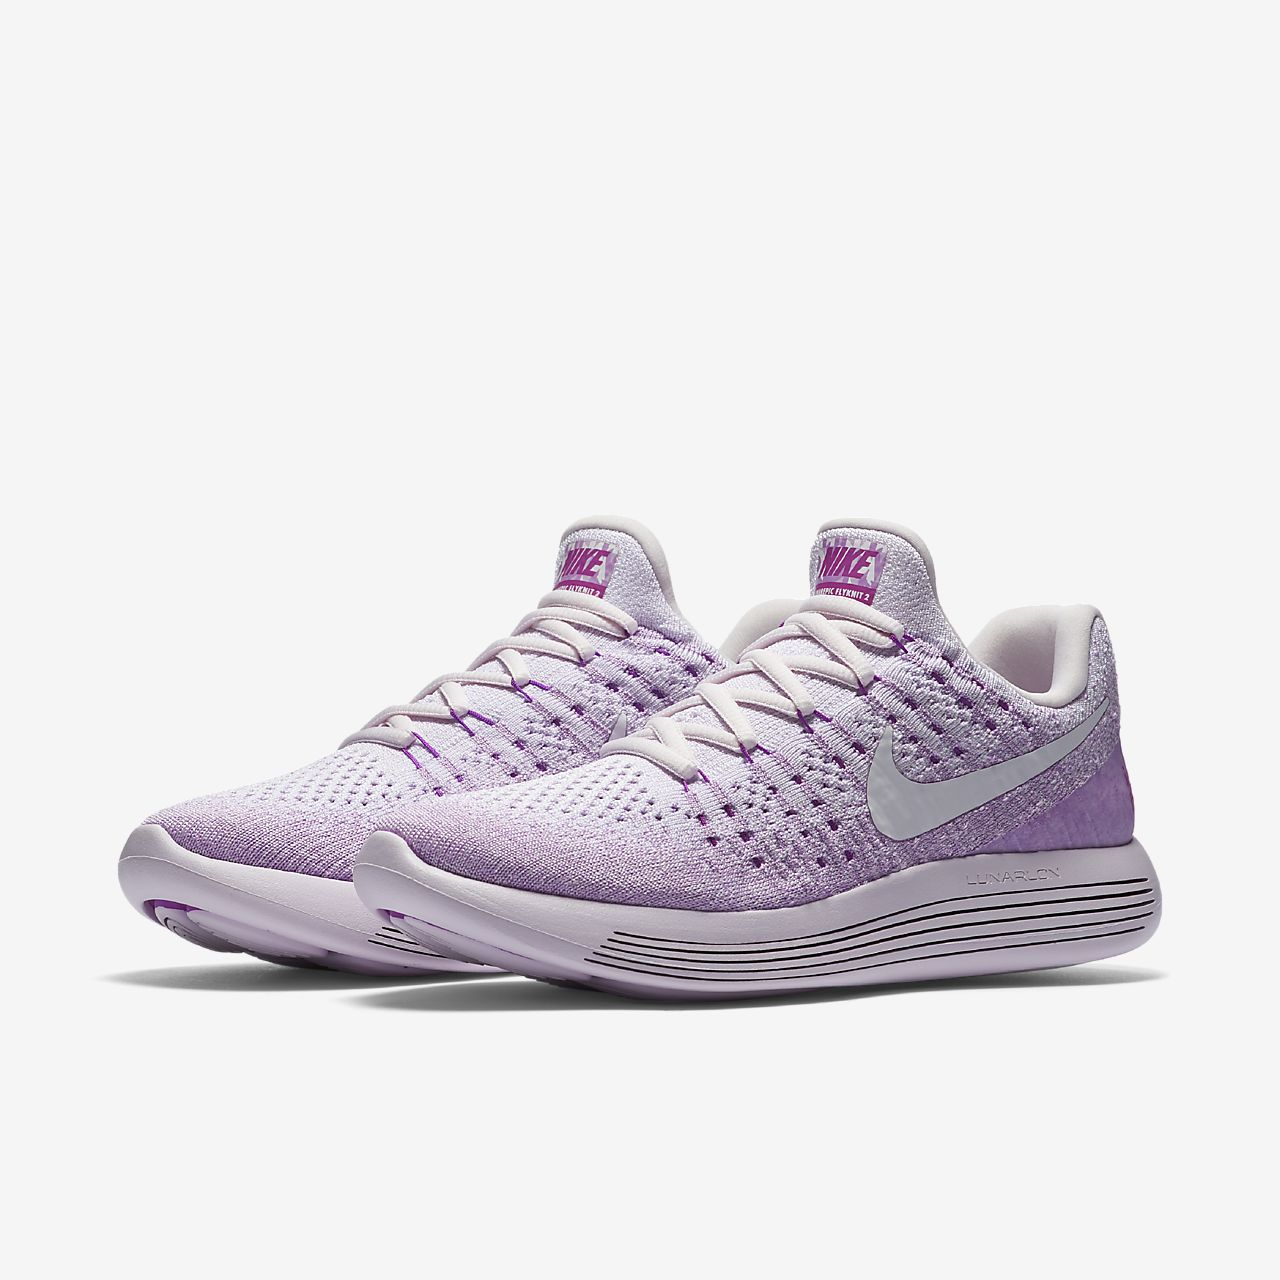 Nike W Nike Lunarepic Low Flyknit Violeta lBk26FN